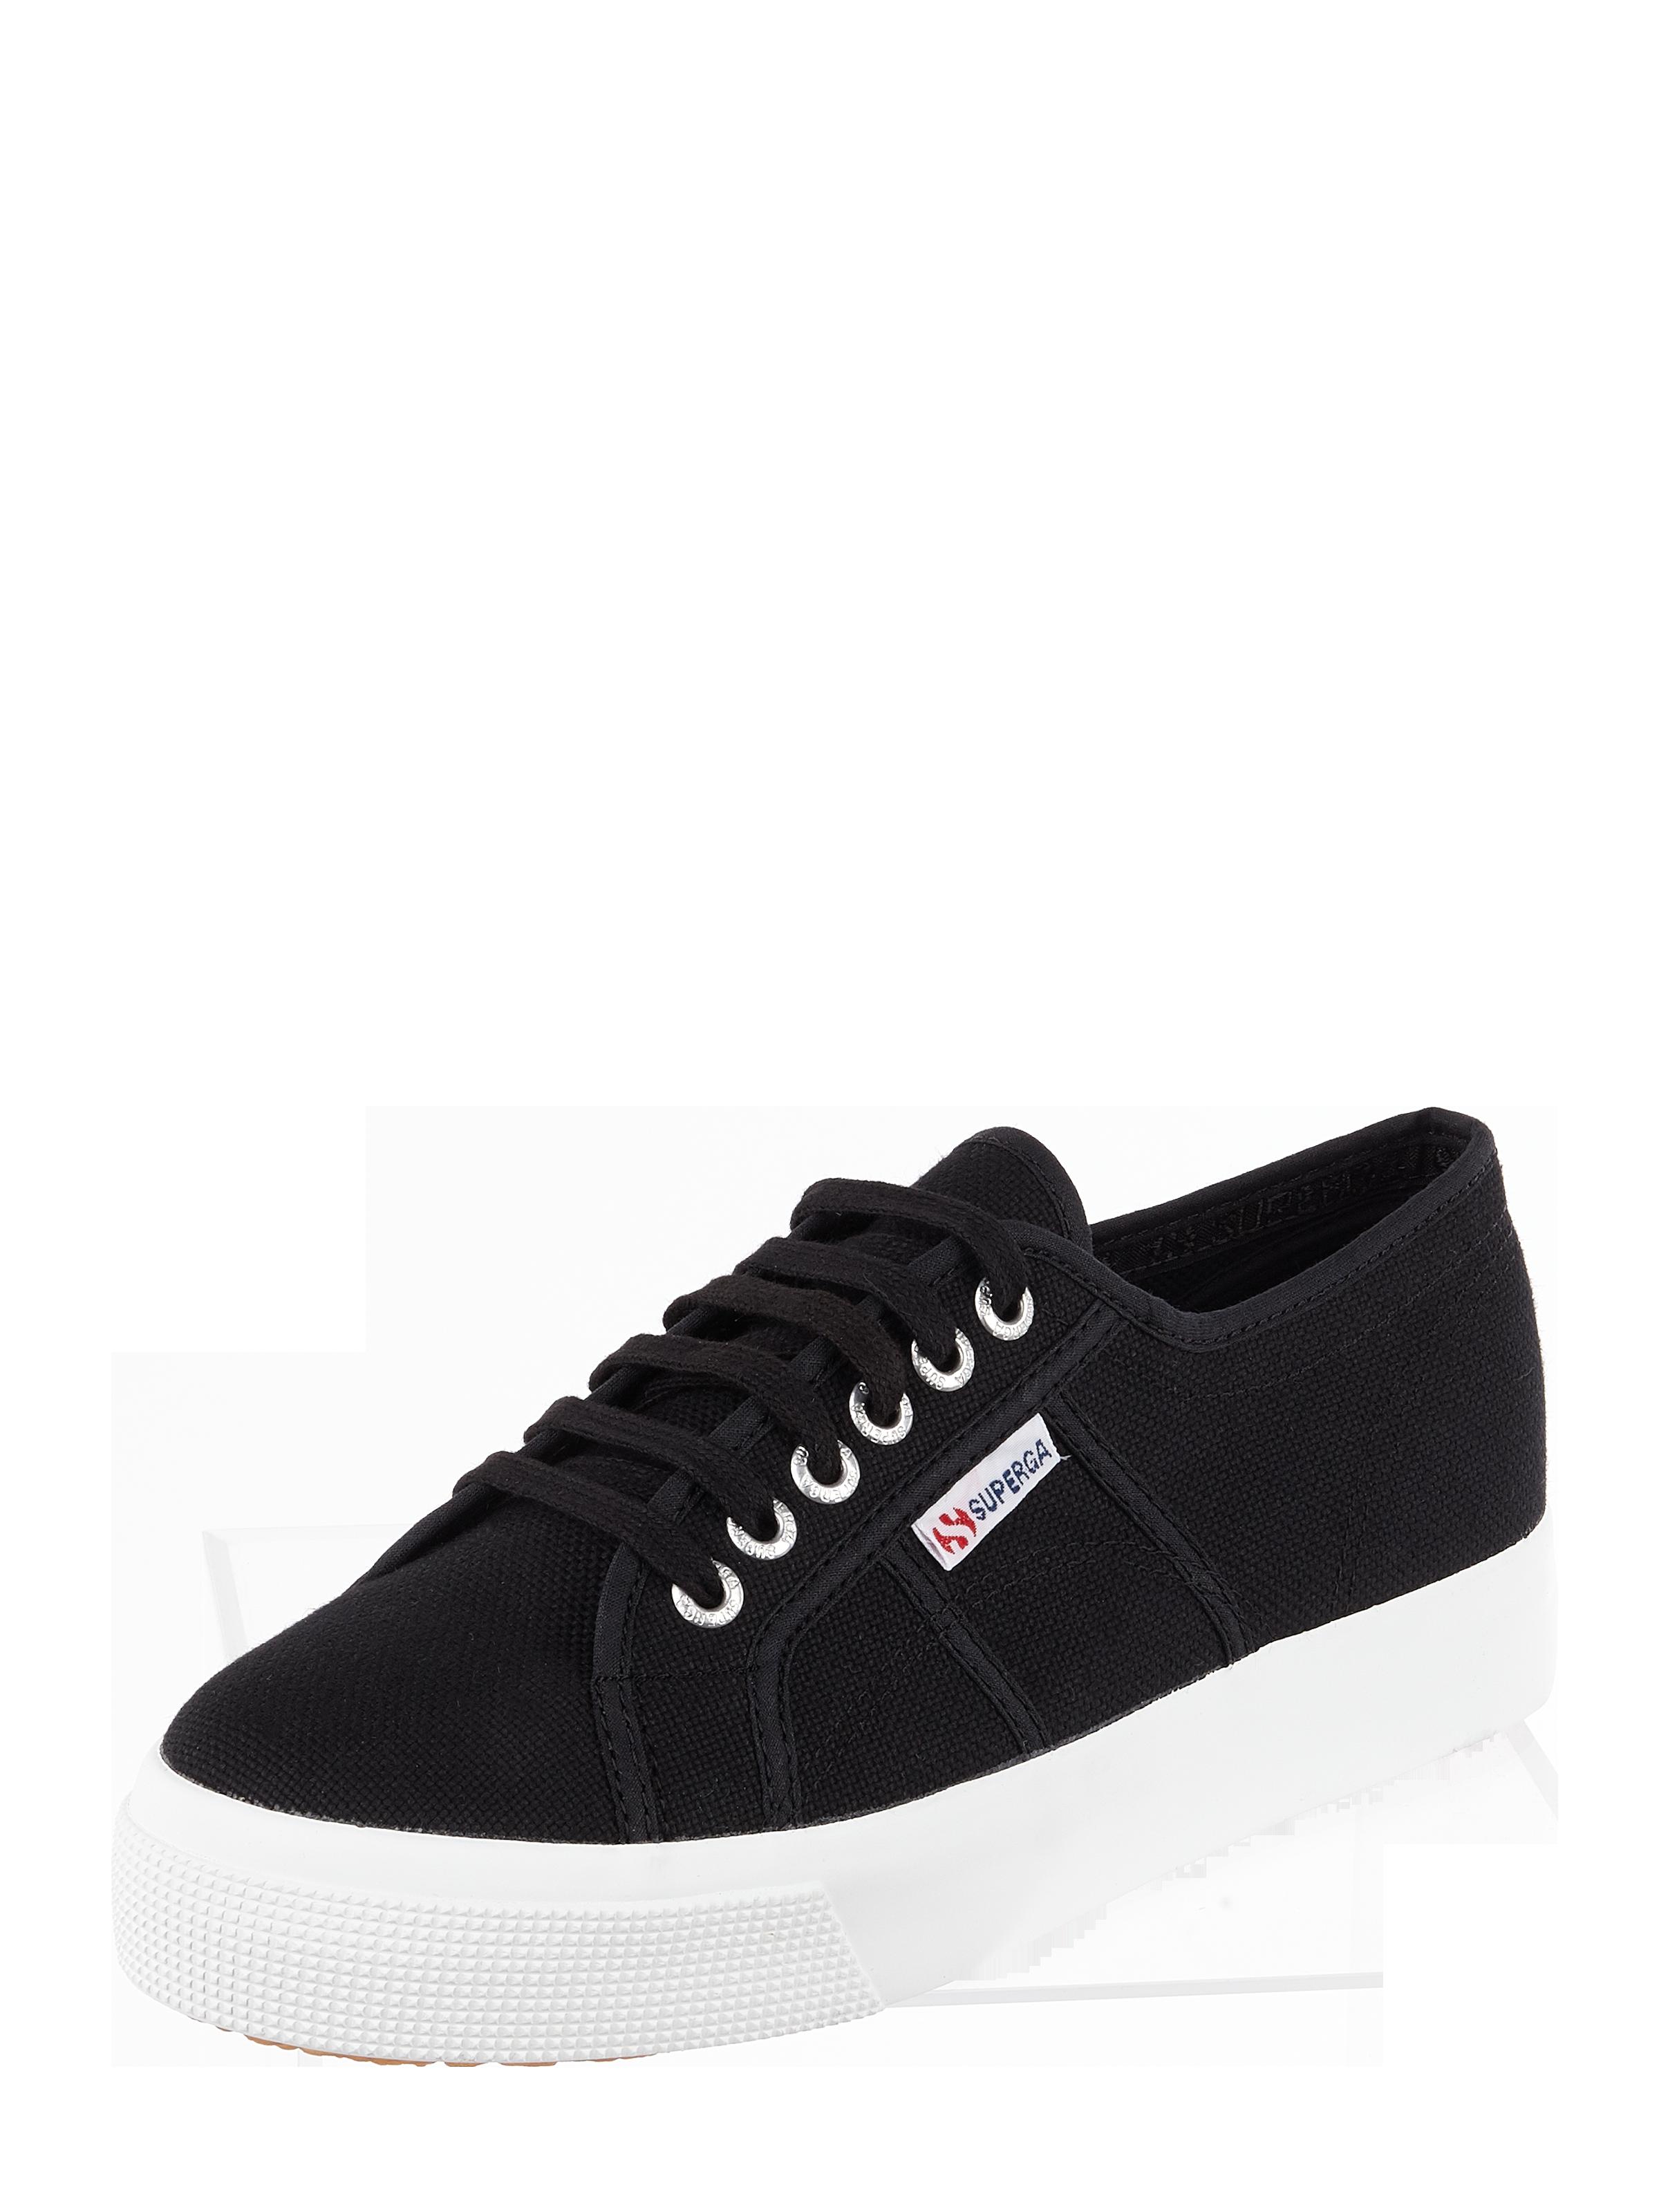 Superga – Plateau Sneaker '2739' aus Canvas – Schwarz